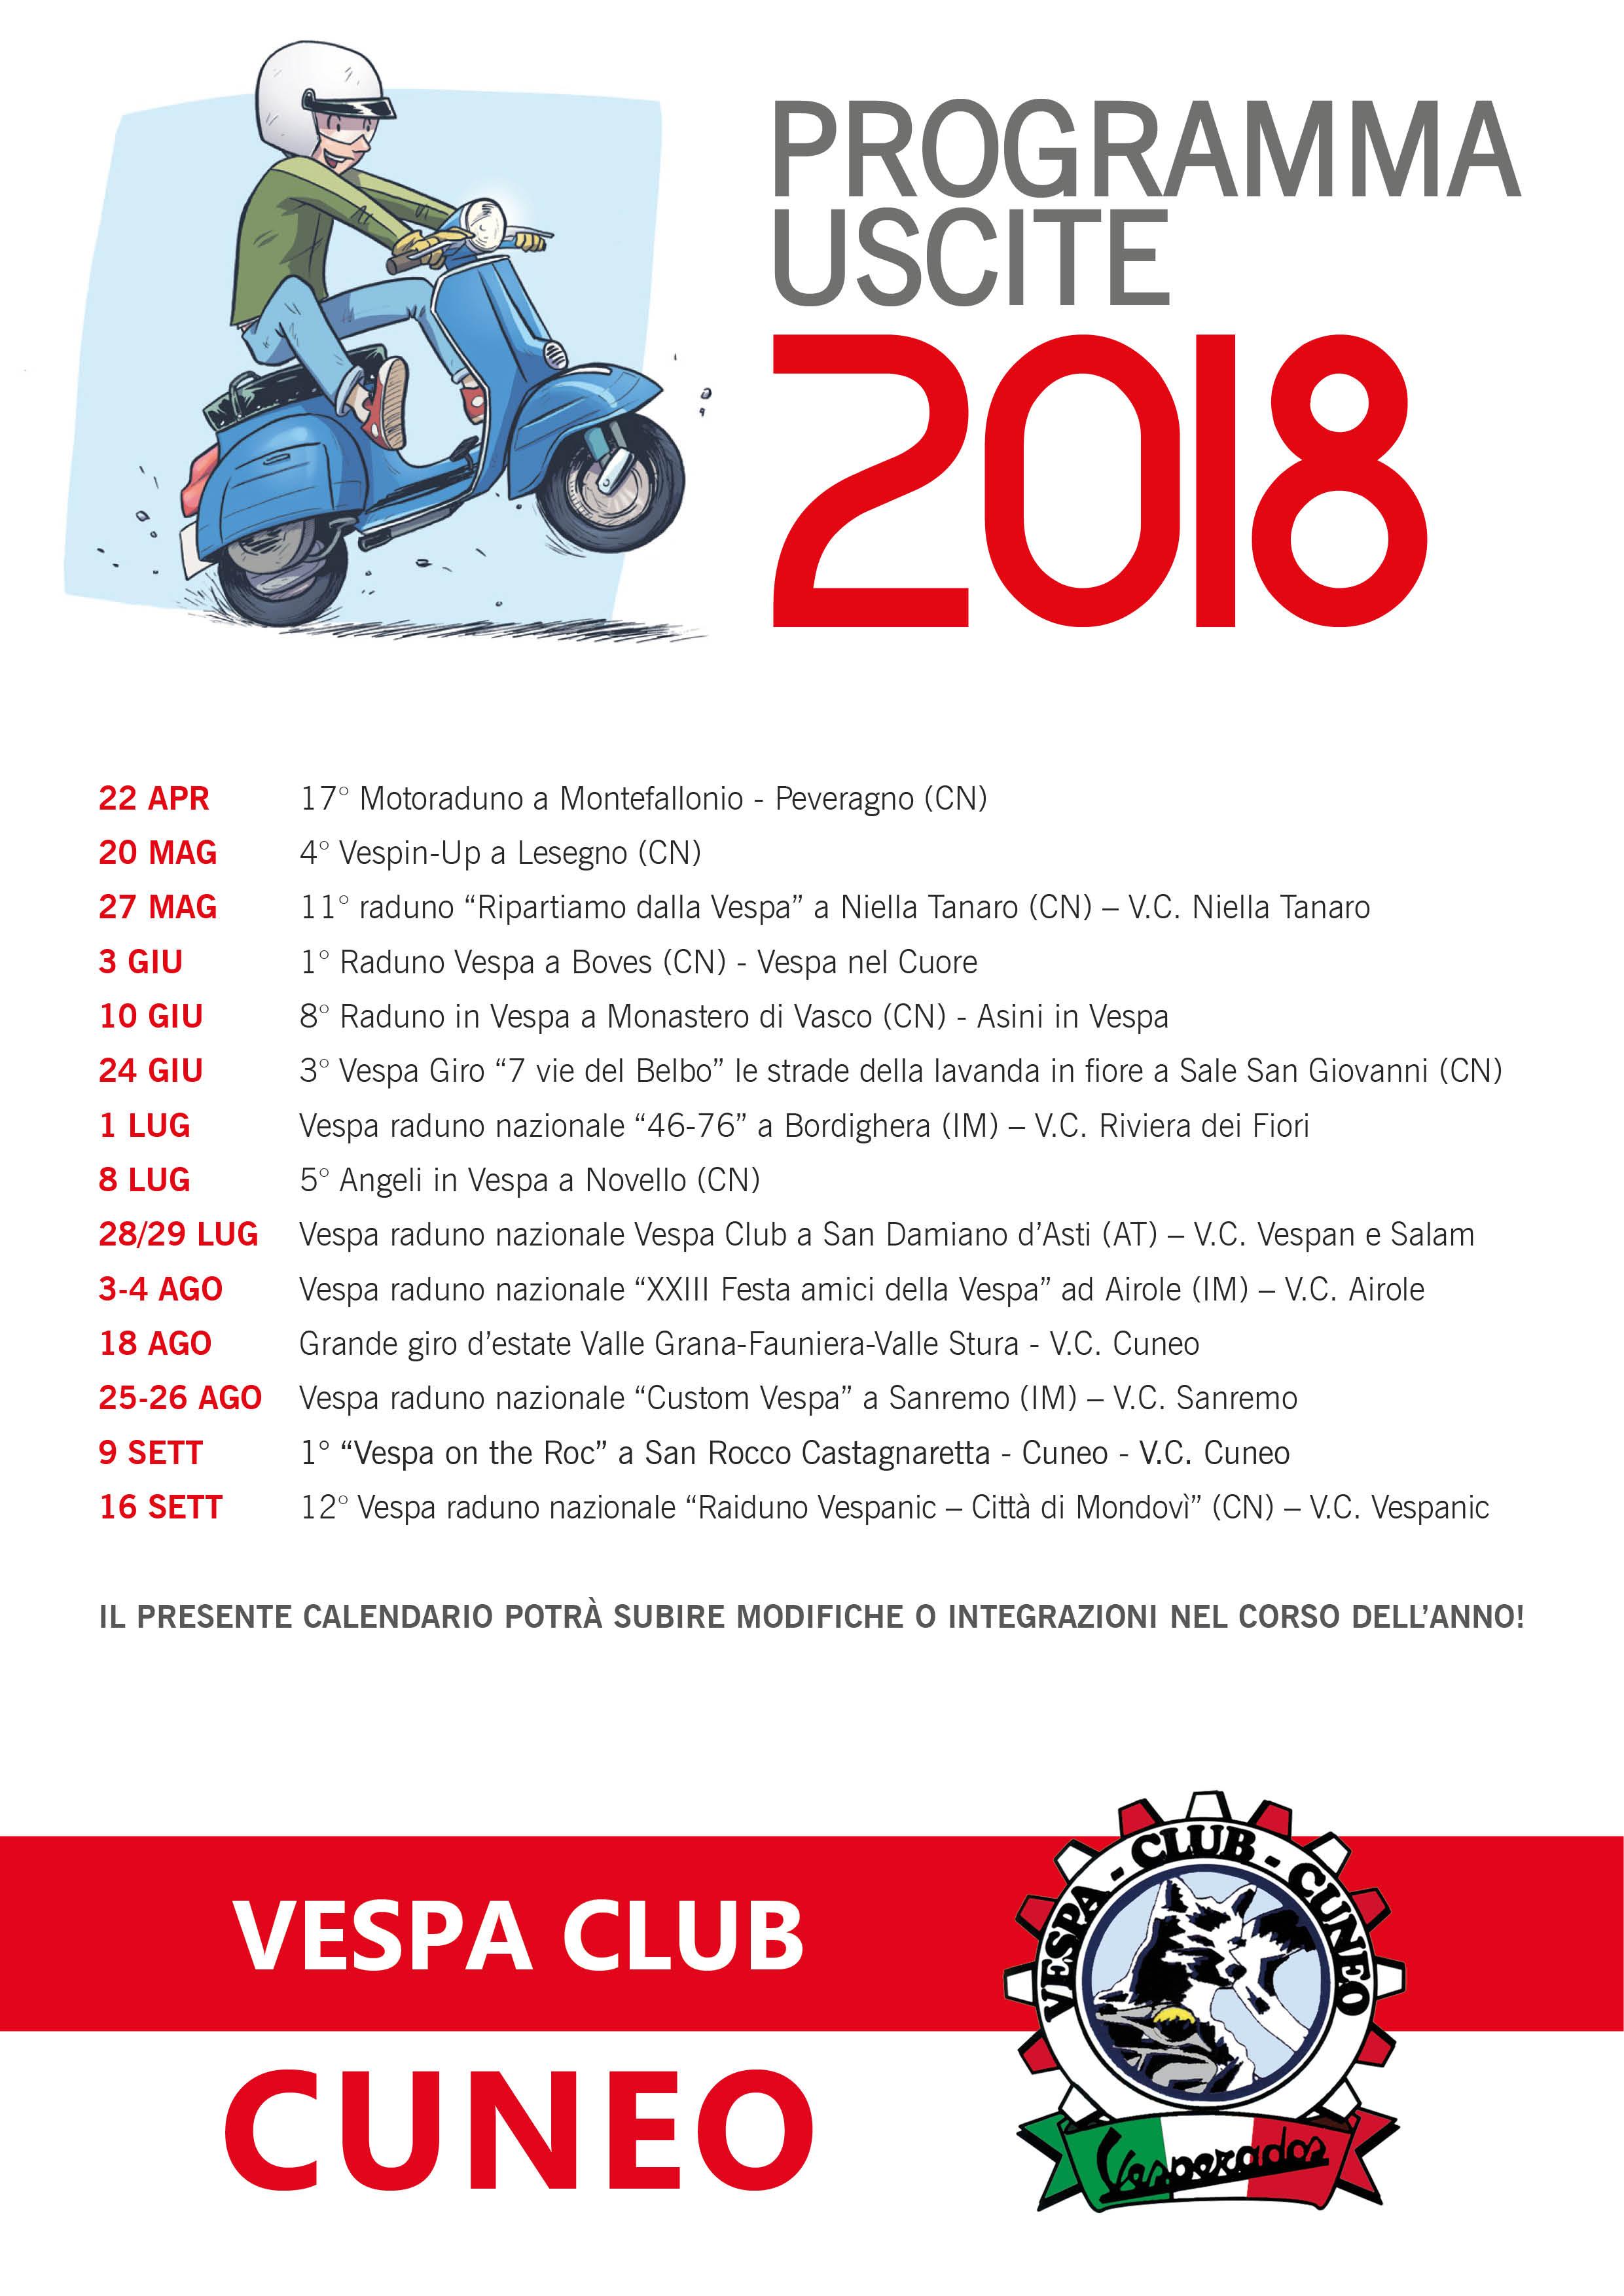 Programma vespa club cuneo for Vespa club volta mantovana